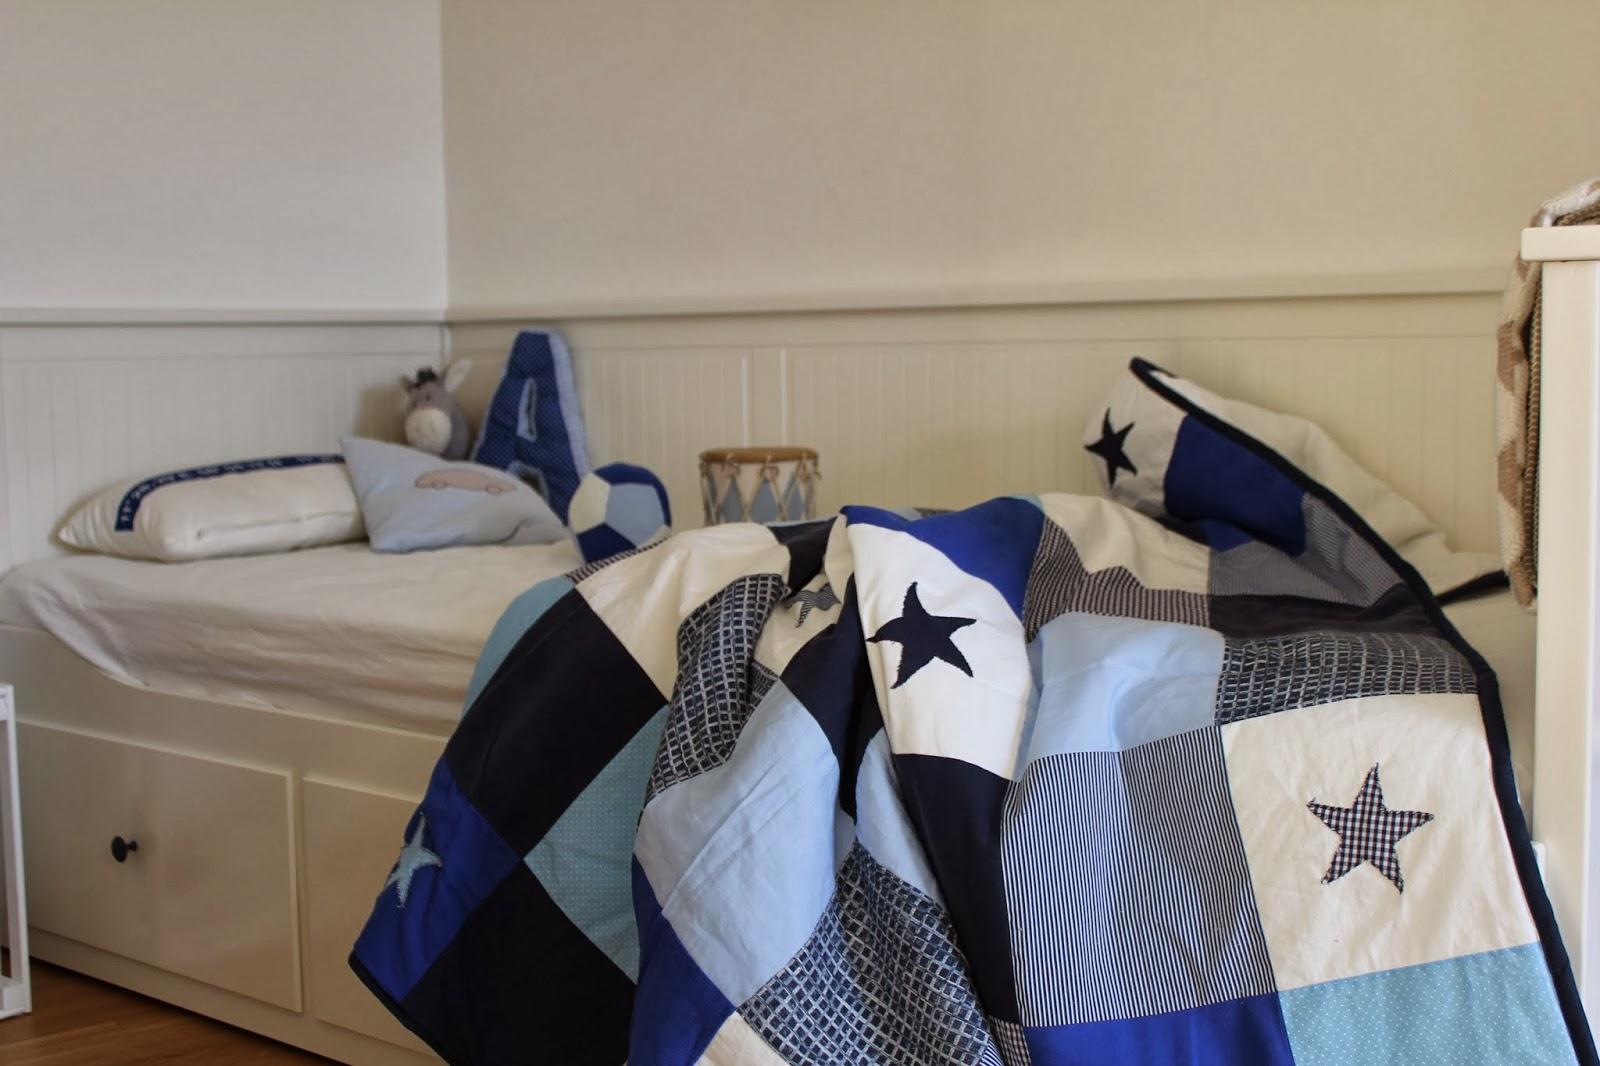 deko impressionen neues im kizi bett nachtk stchen kissen. Black Bedroom Furniture Sets. Home Design Ideas